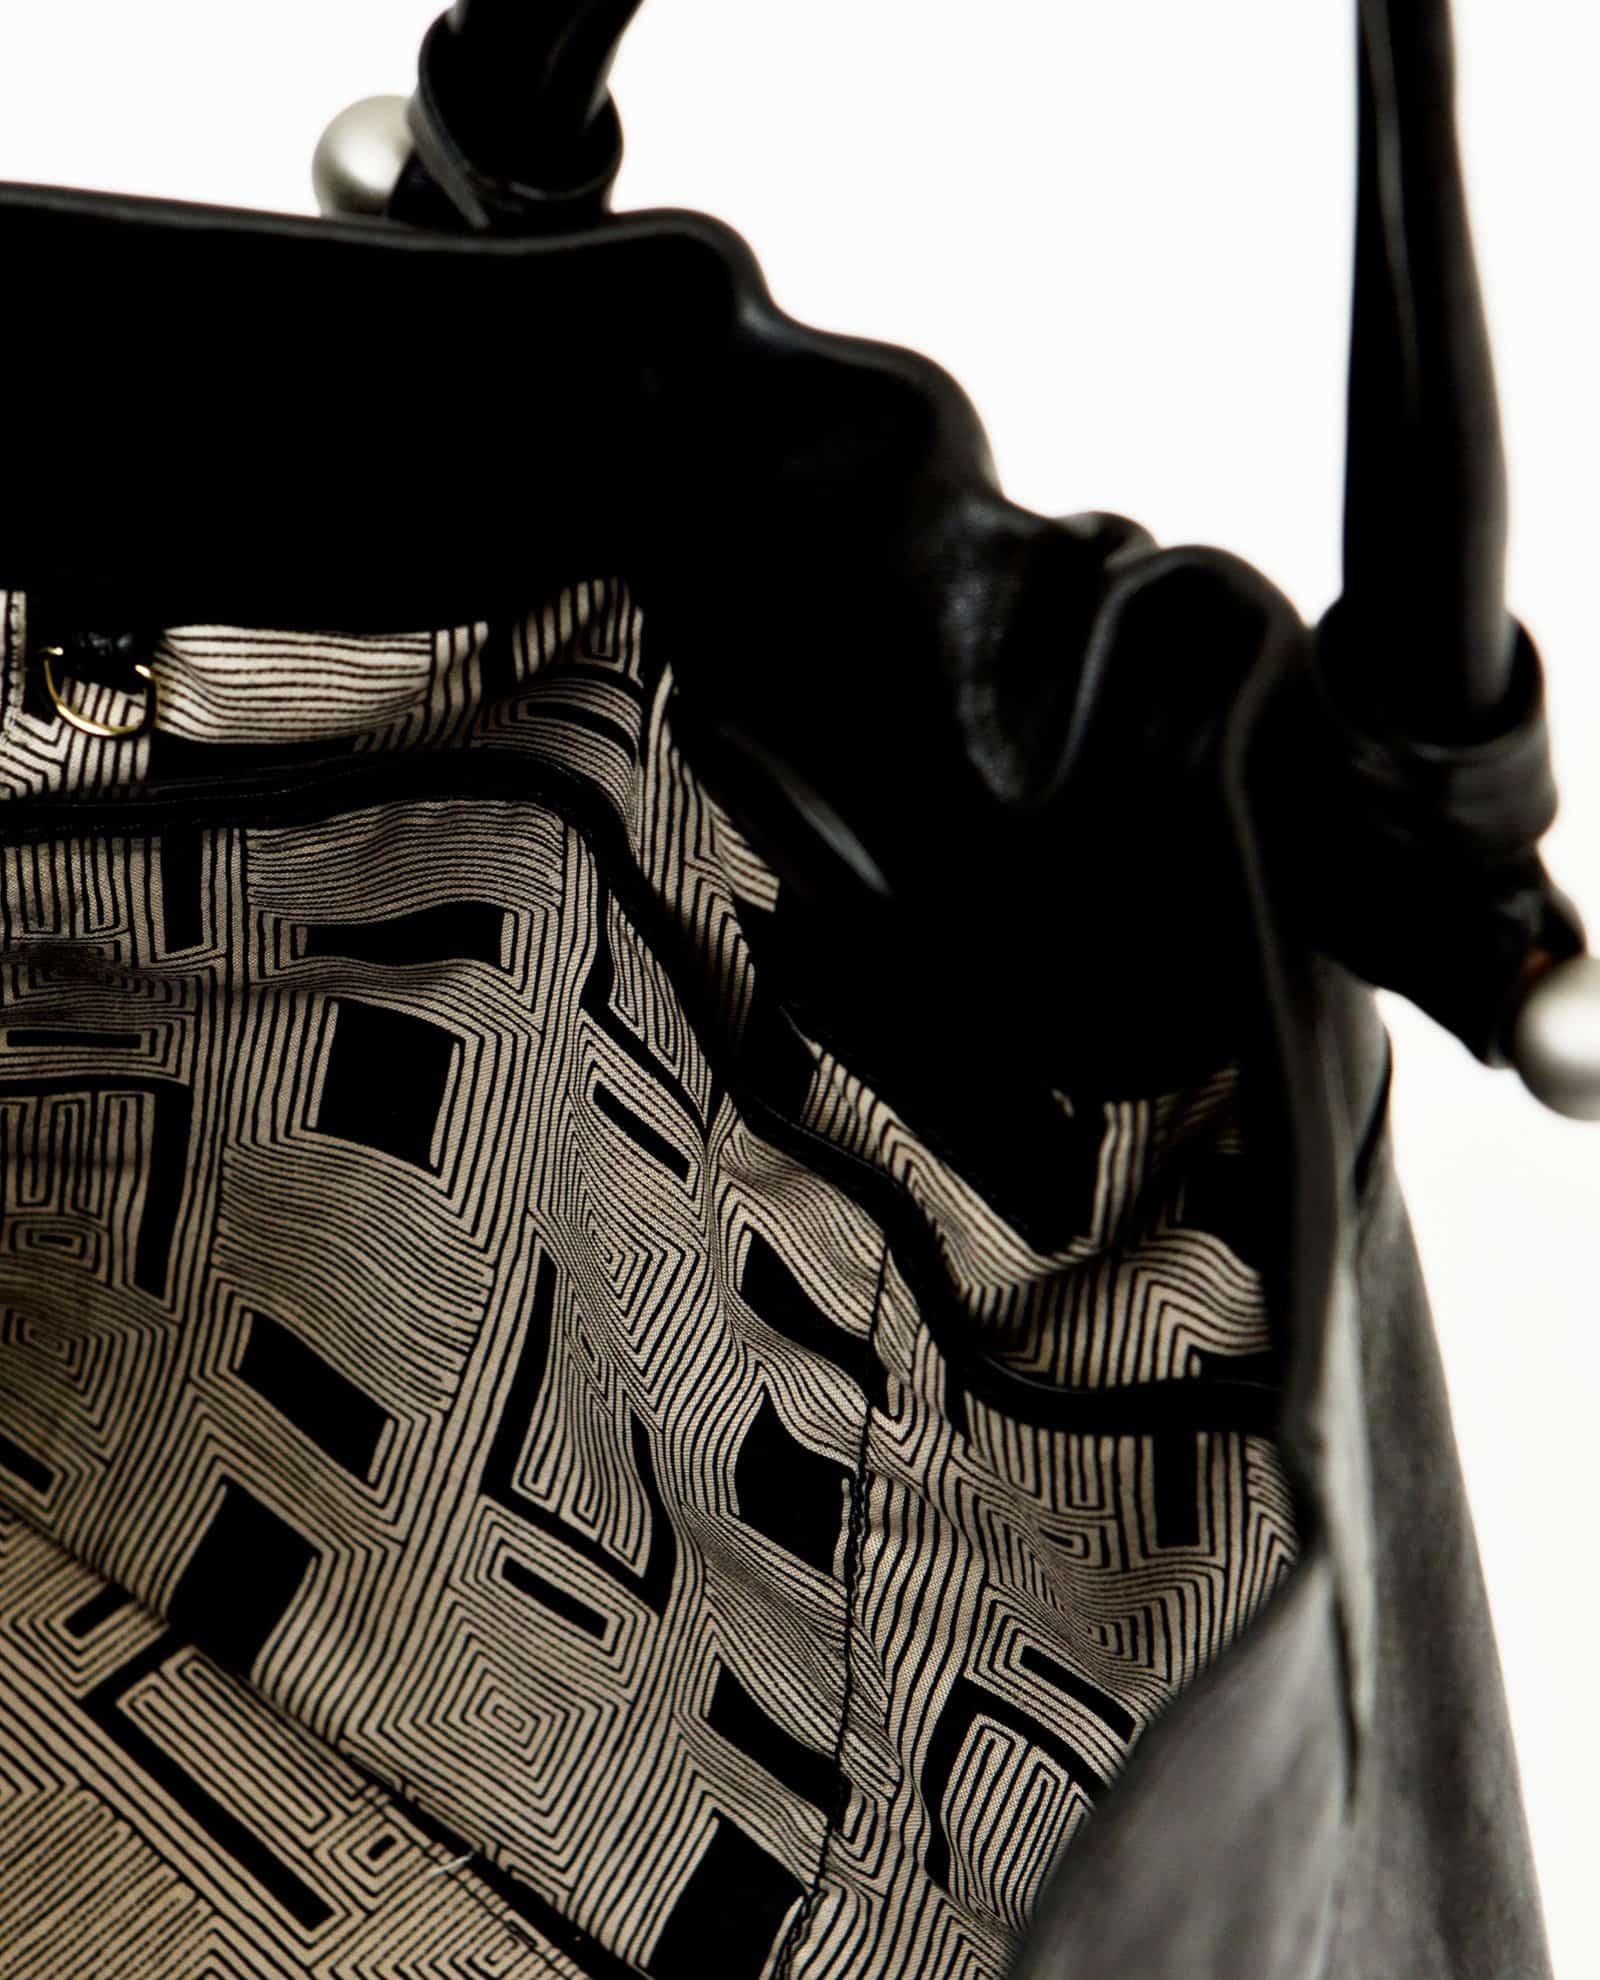 NINA Poldi Vintage & negro interior. Modelo Nina Petty Things (ref # NIPP03-1-V18)